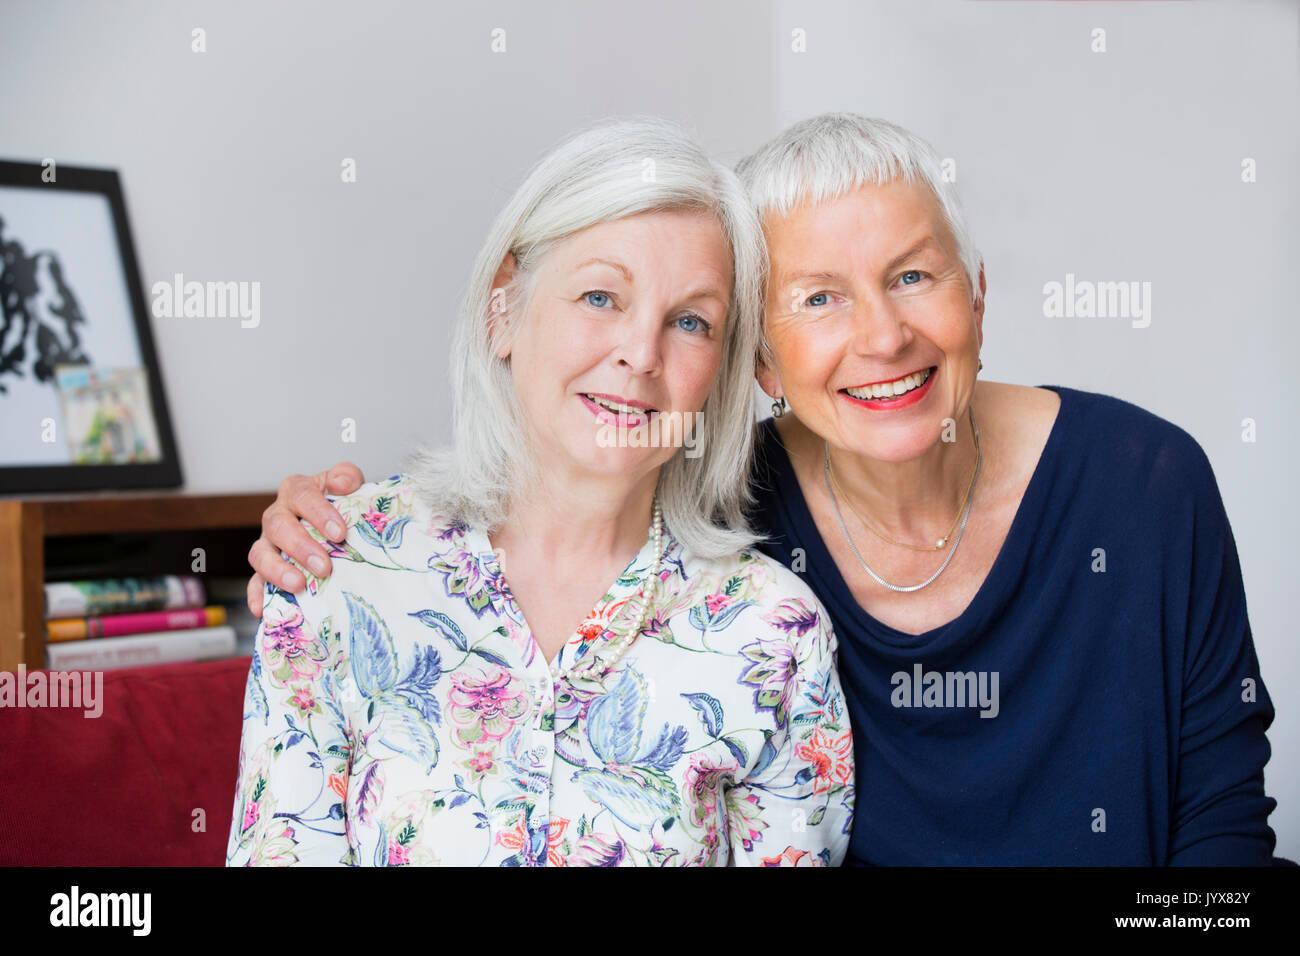 Portrait of two older women - Stock Image